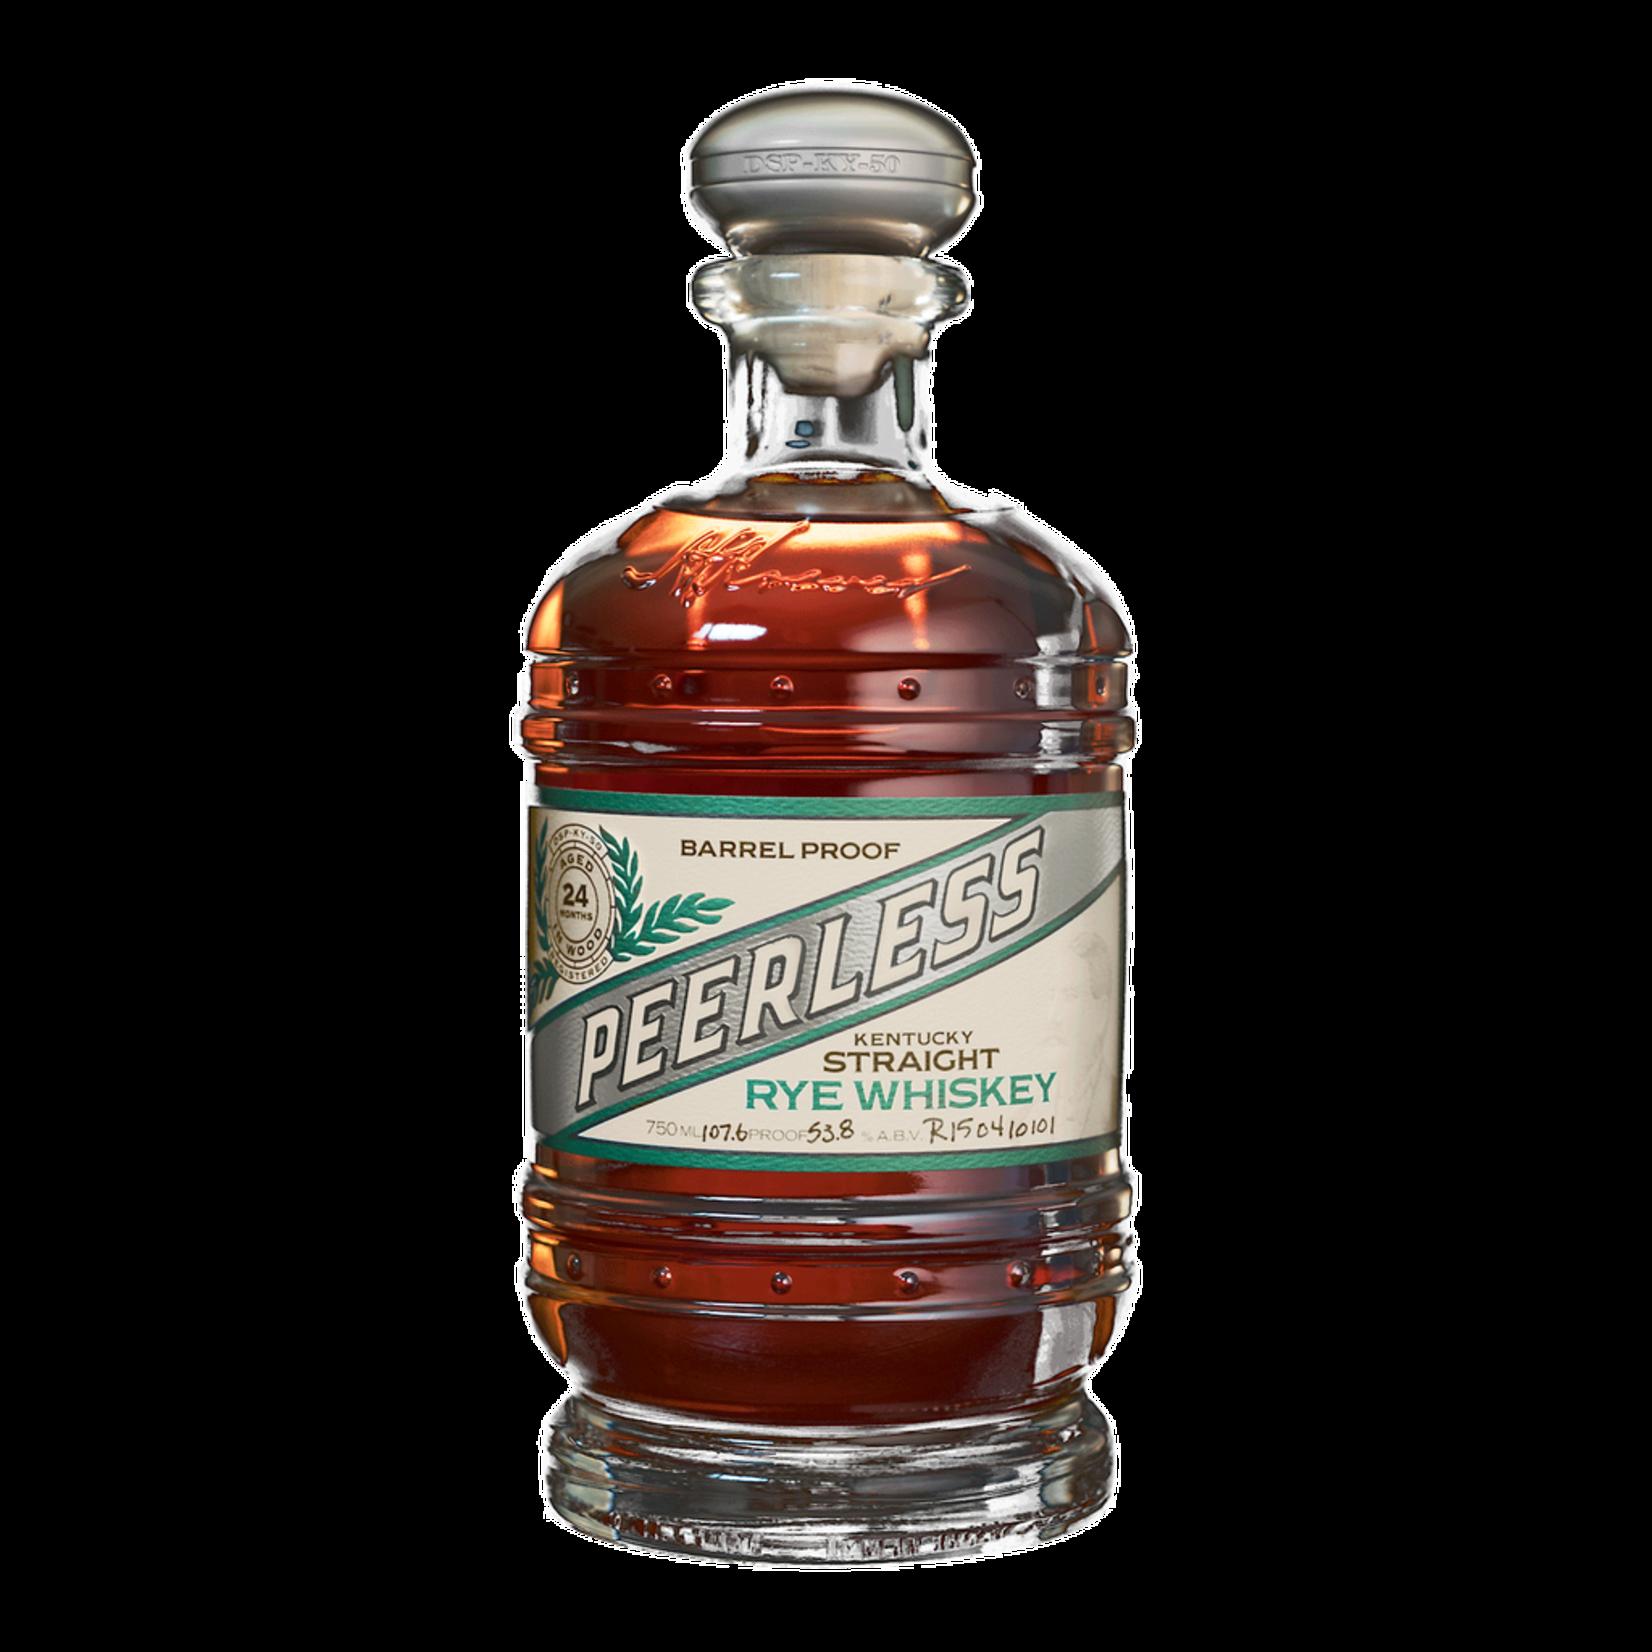 Spirits Peerless Rye Whiskey Barrel Proof